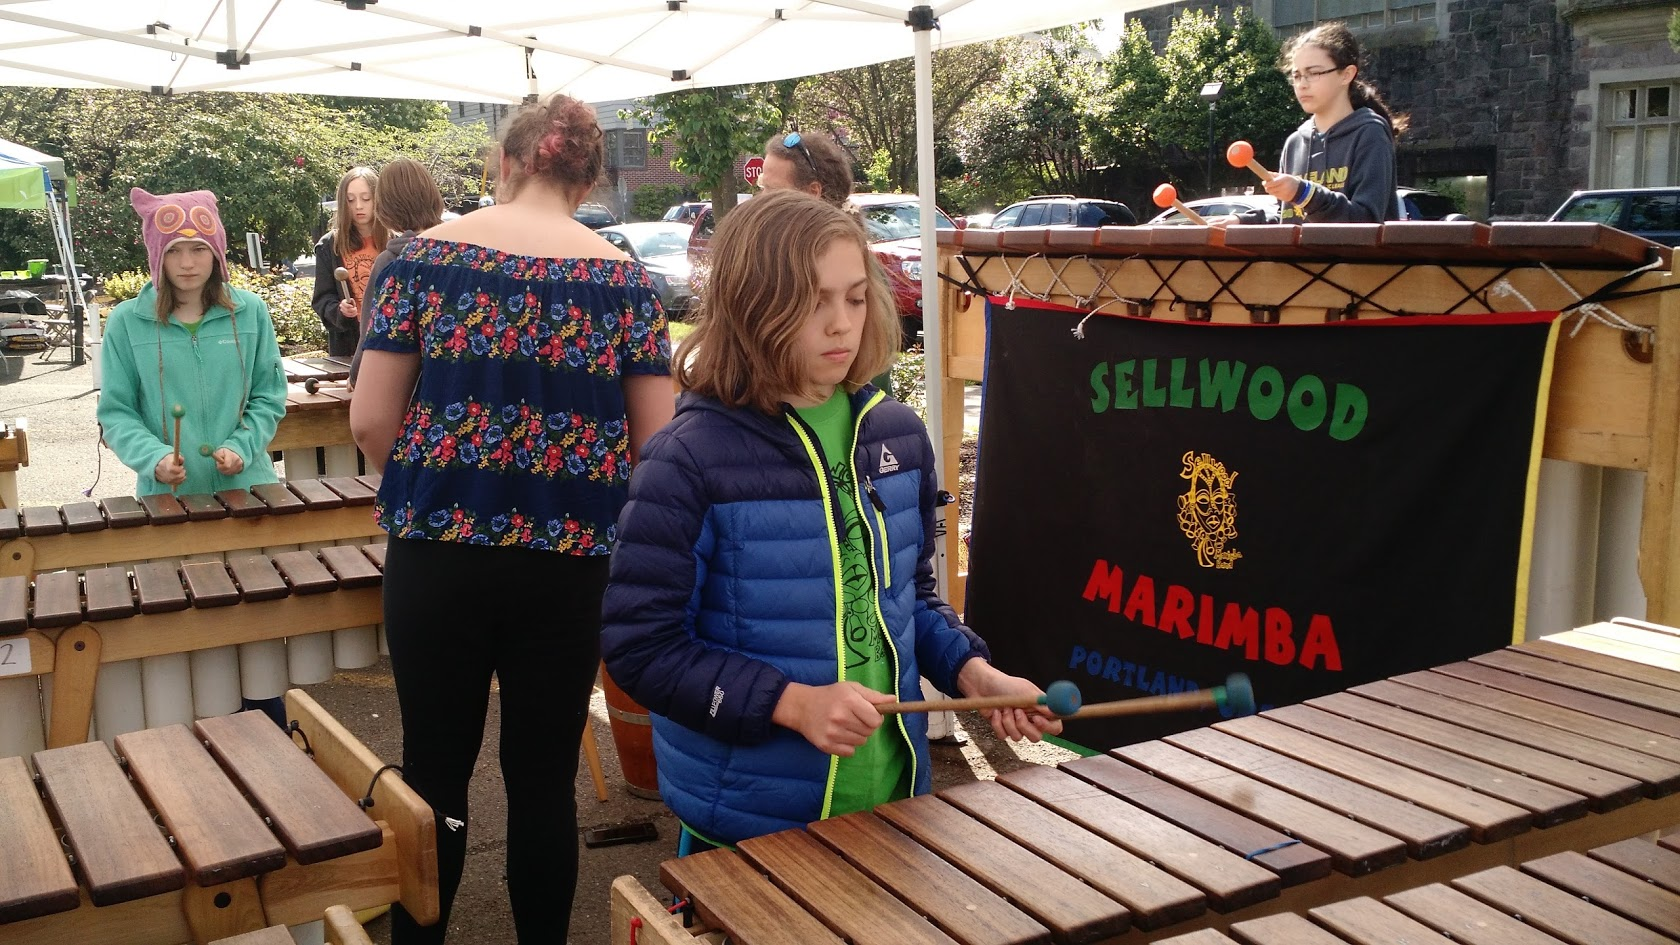 Sellwood Marimba Band.jpg